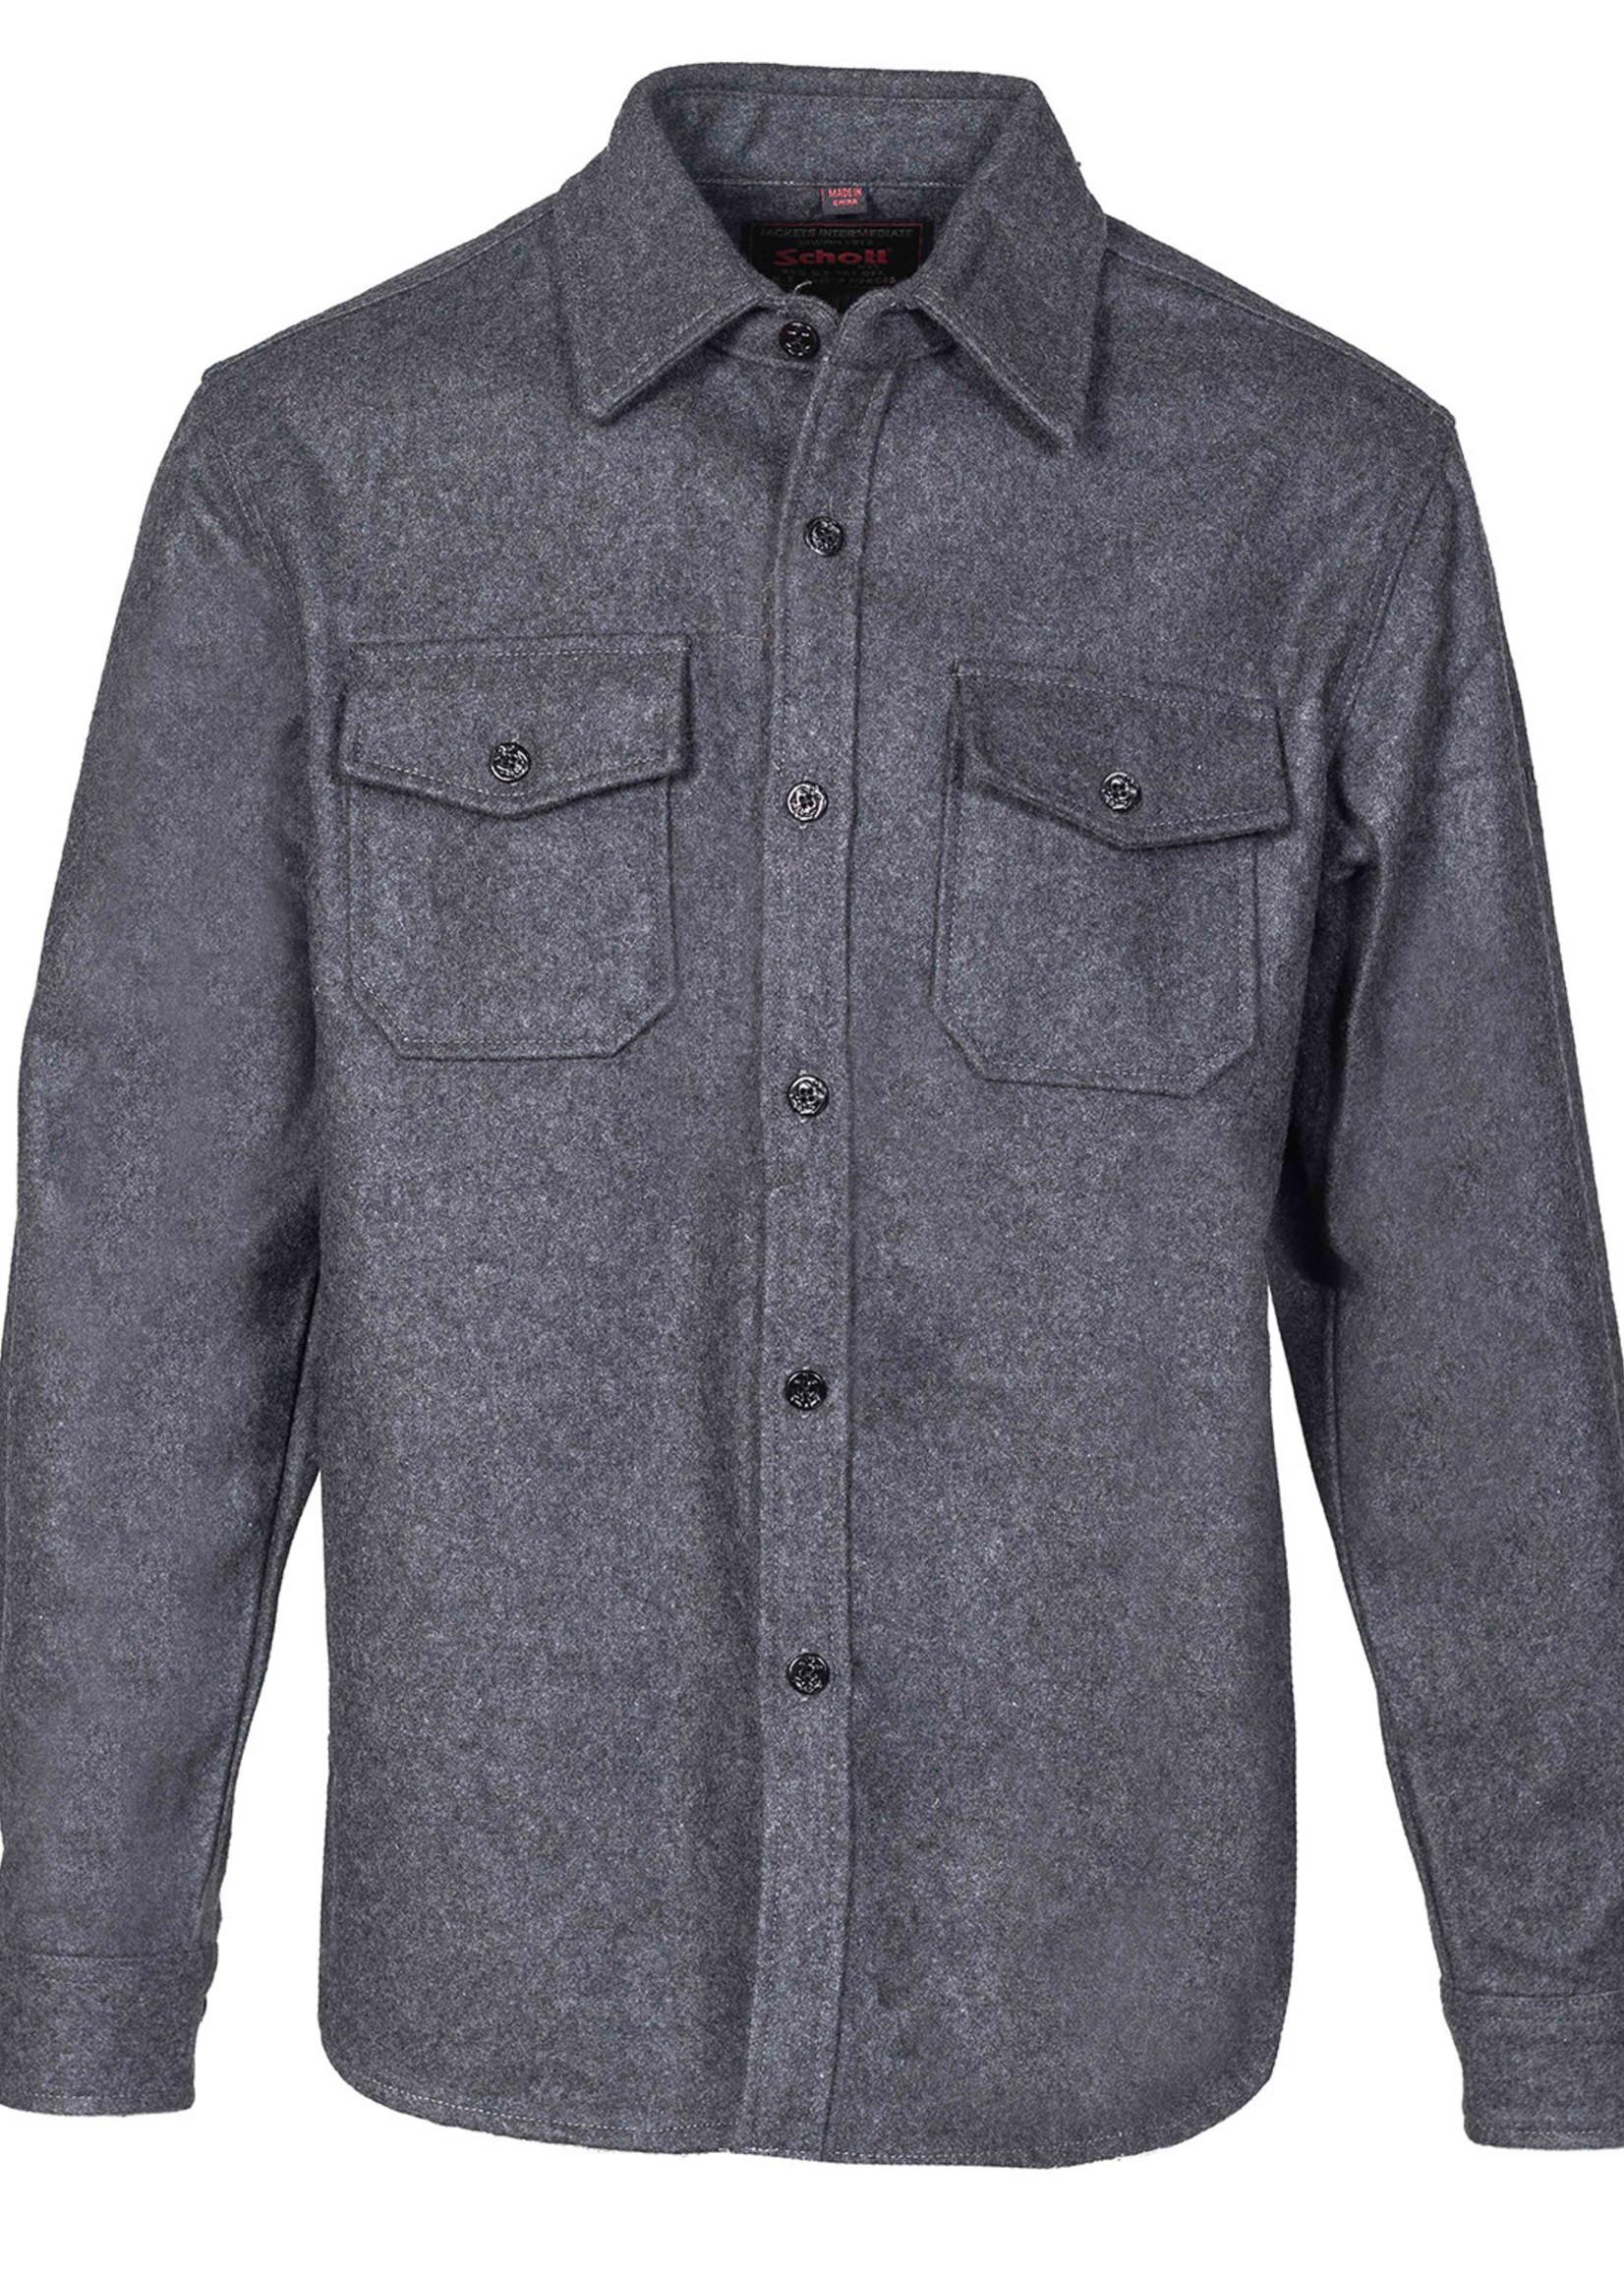 Schott CPO Overshirt Grey Wool Flannel